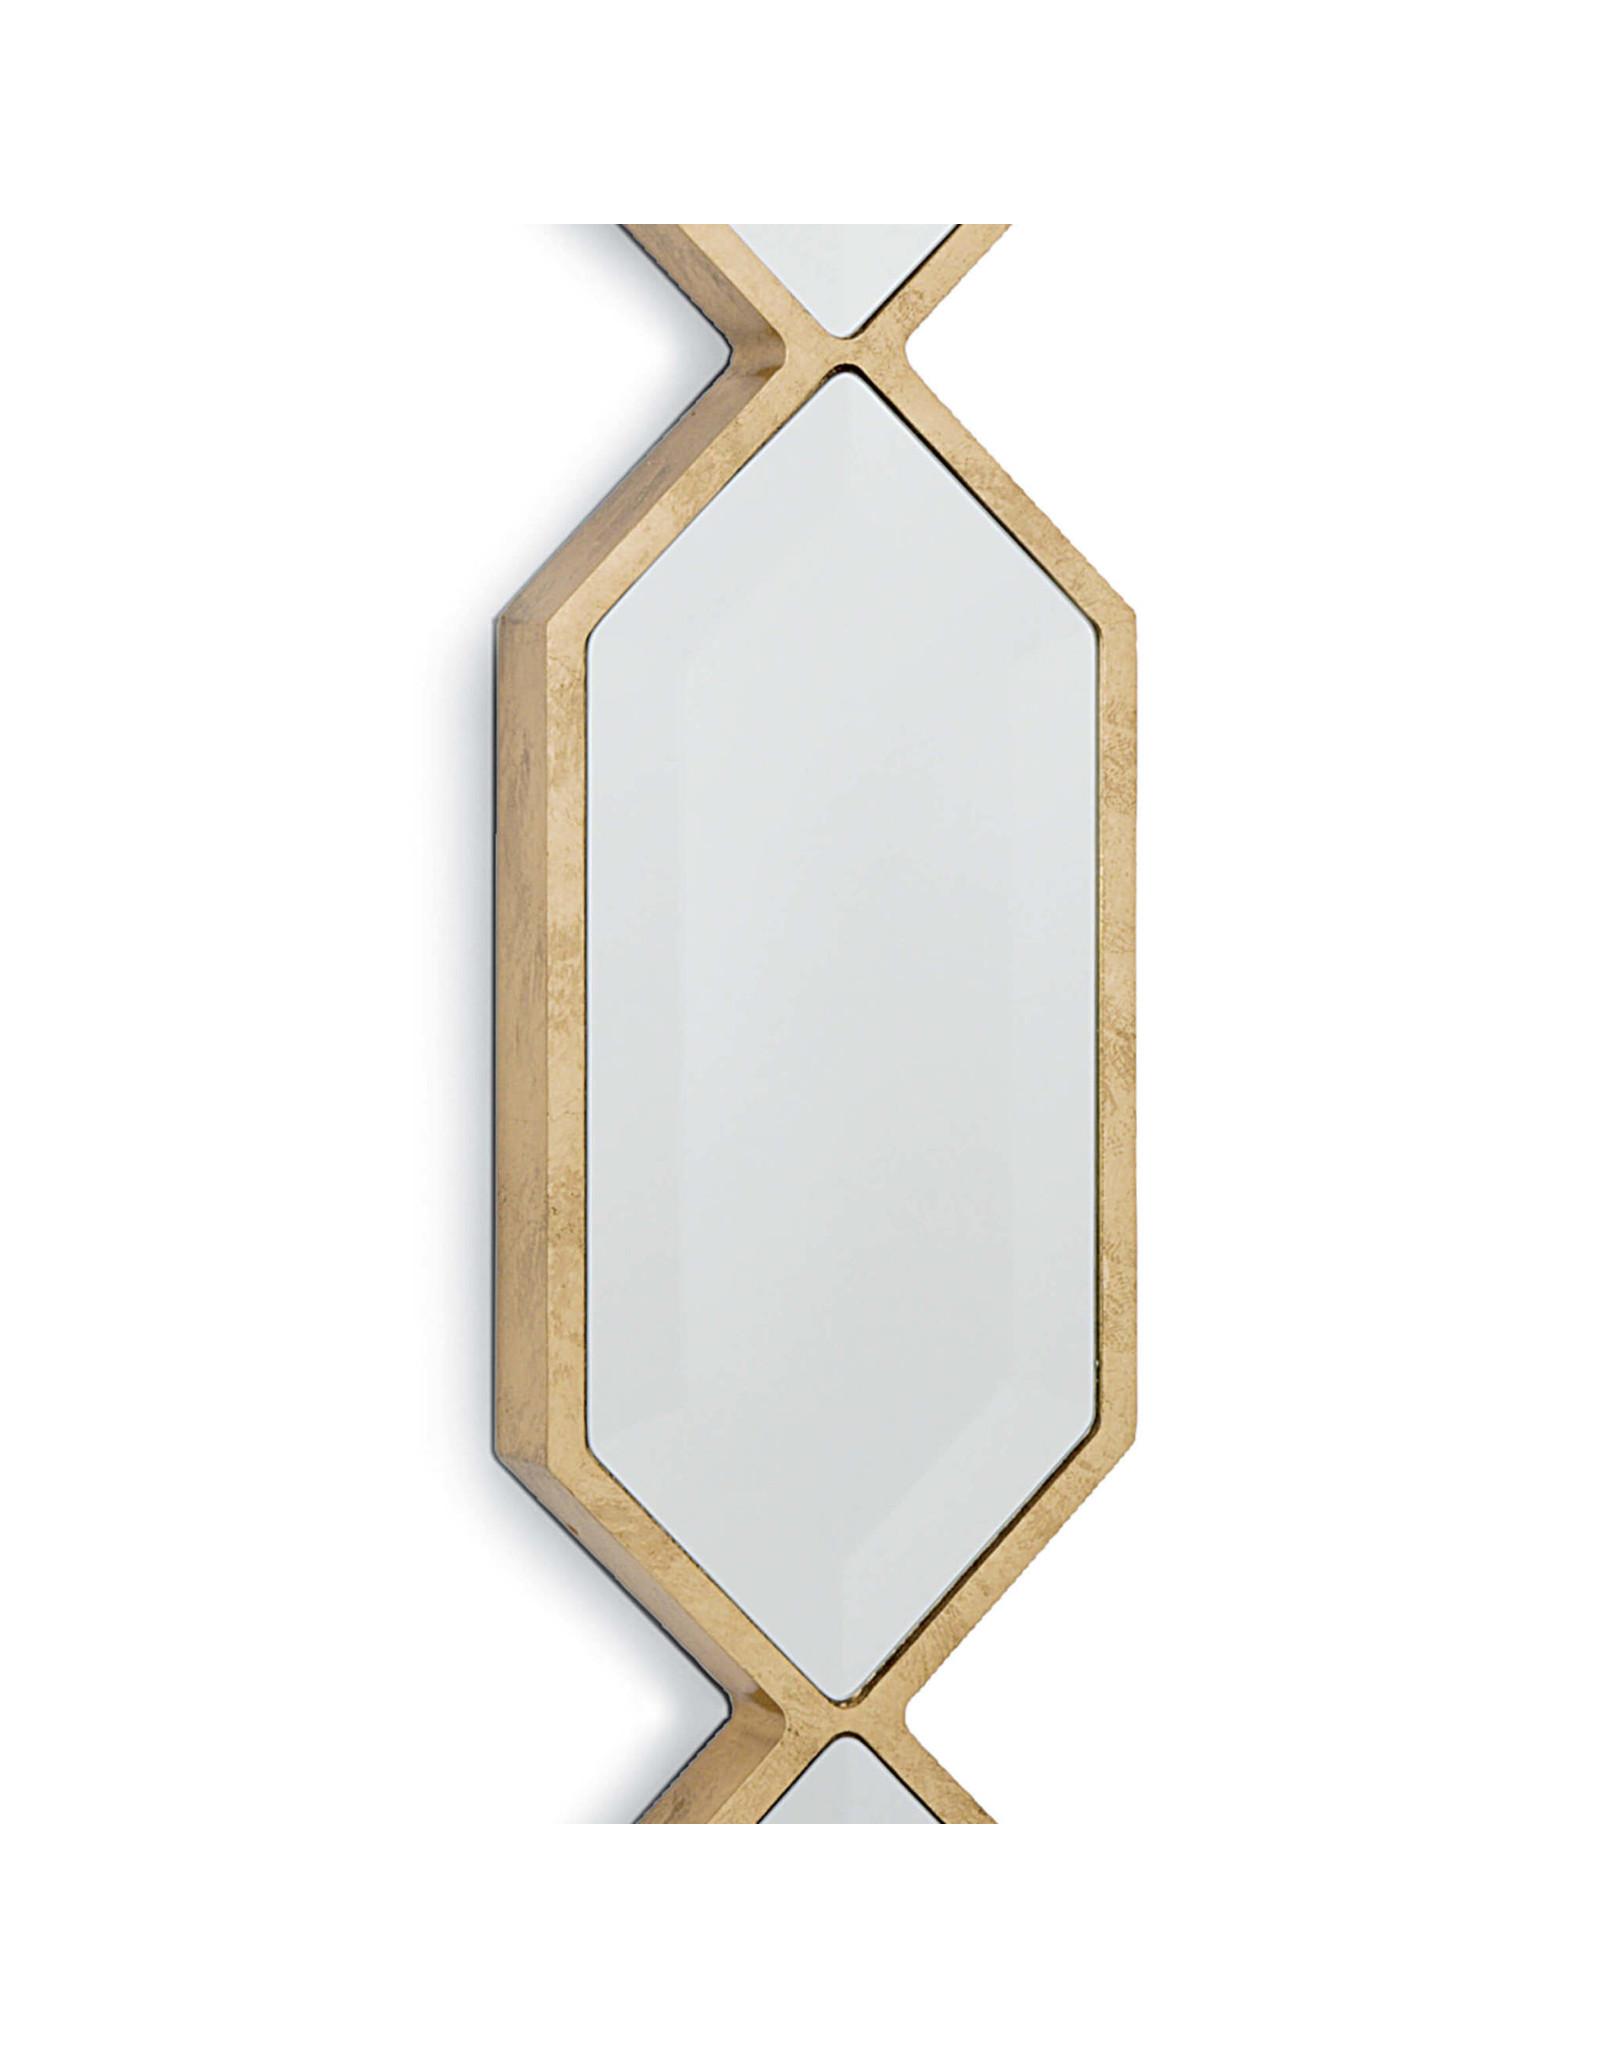 Regina Andrew Design Triple Diamond Wall Panel Mirror Gold Leaf Urbane Home And Lifestyle